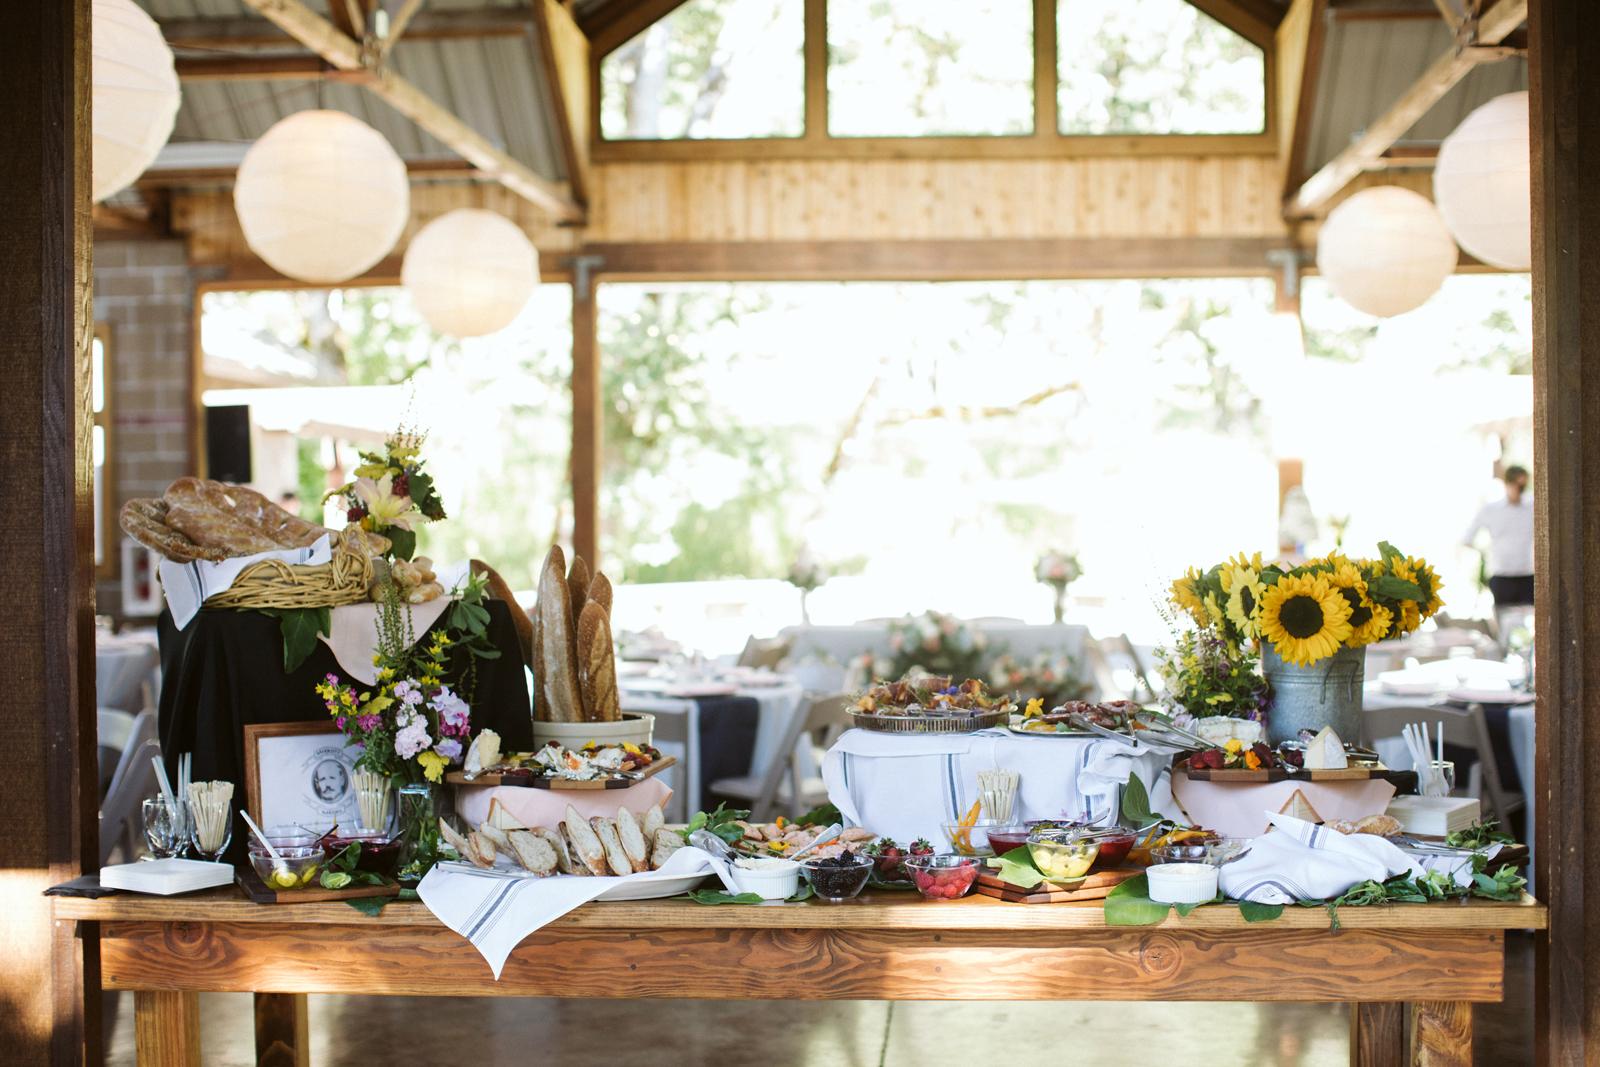 067-daronjackson-rachel-michael-wedding-mtpisgah.jpg